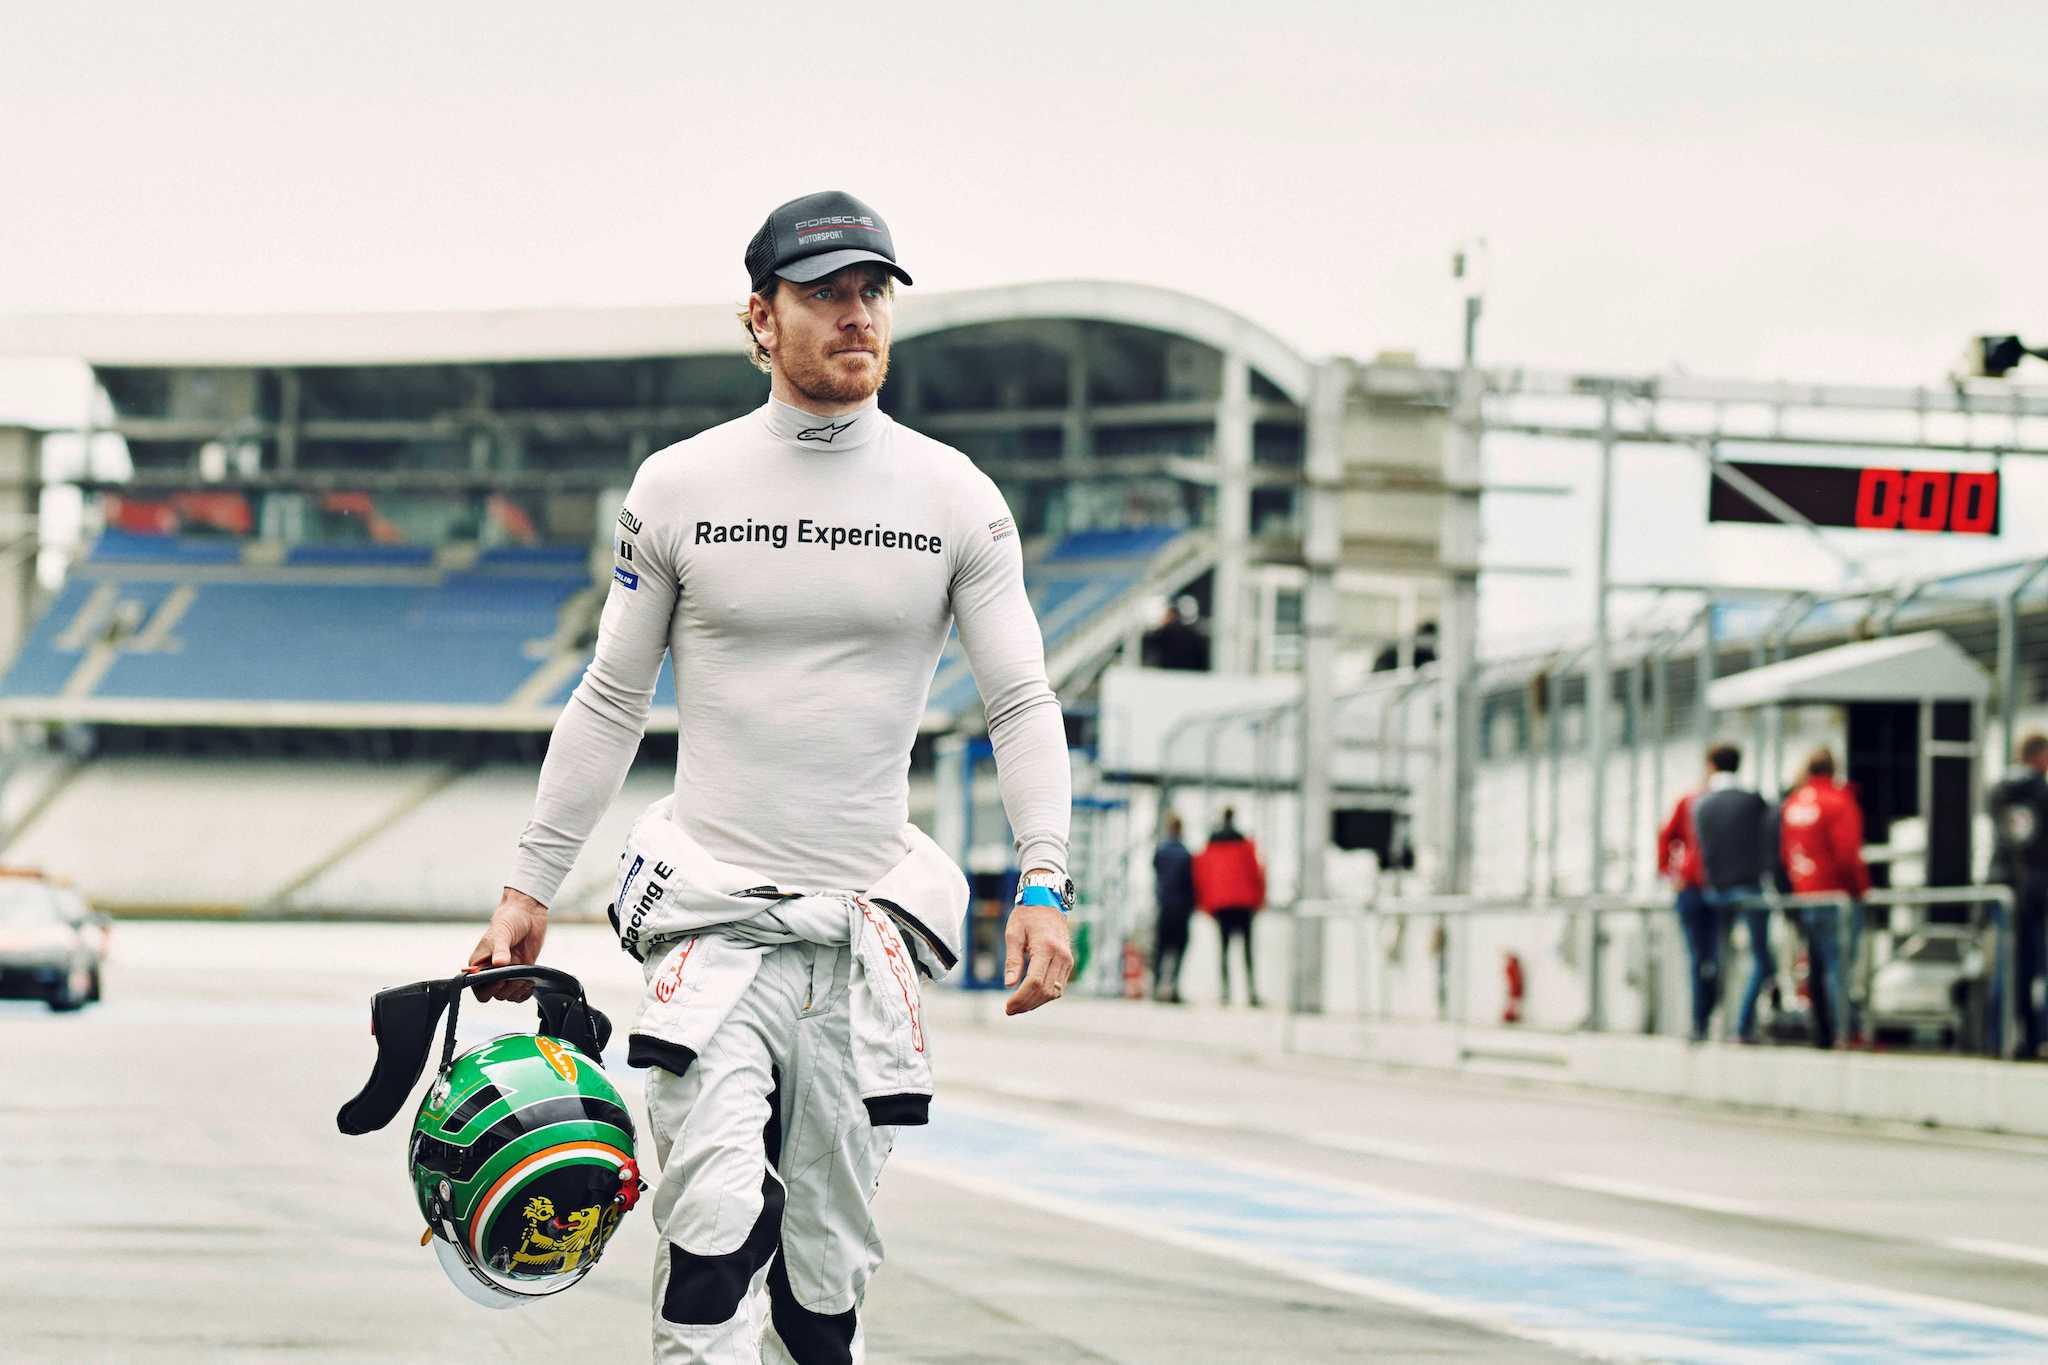 Michael Fassbender 以保時捷的駕駛體驗開啟了他的賽車生涯。